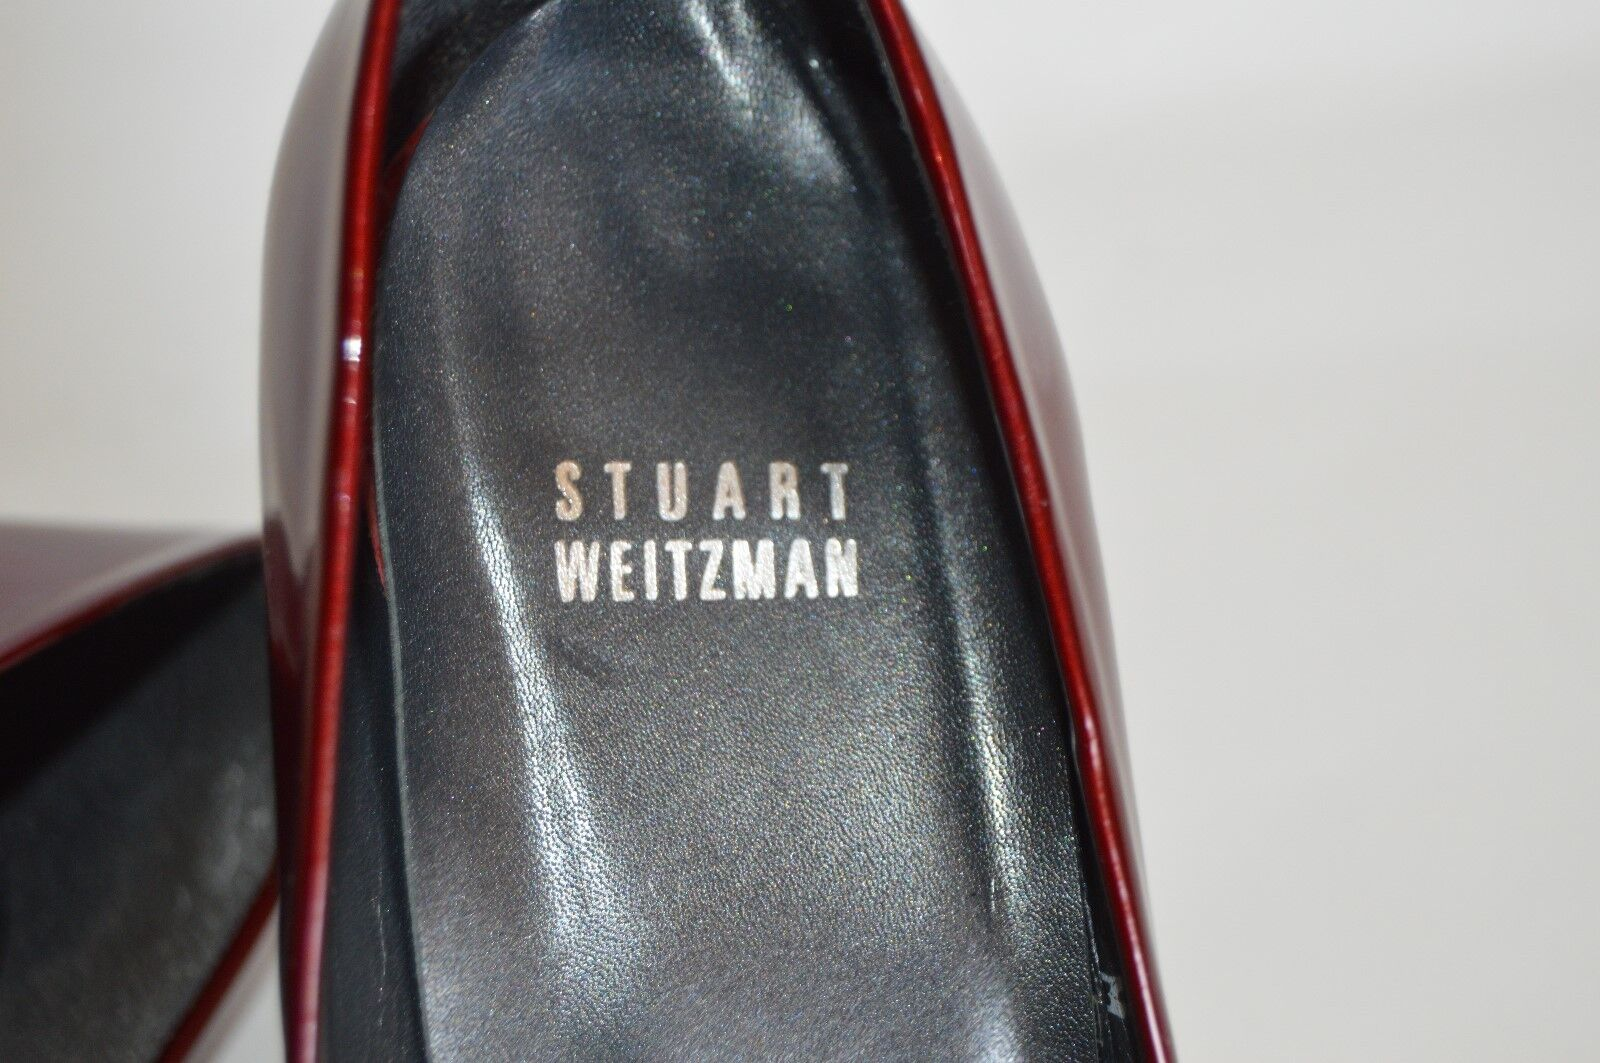 STUART WEITZMAN blood rouge patent patent patent leather stiletto peep toe Taille 9 m 6ce097